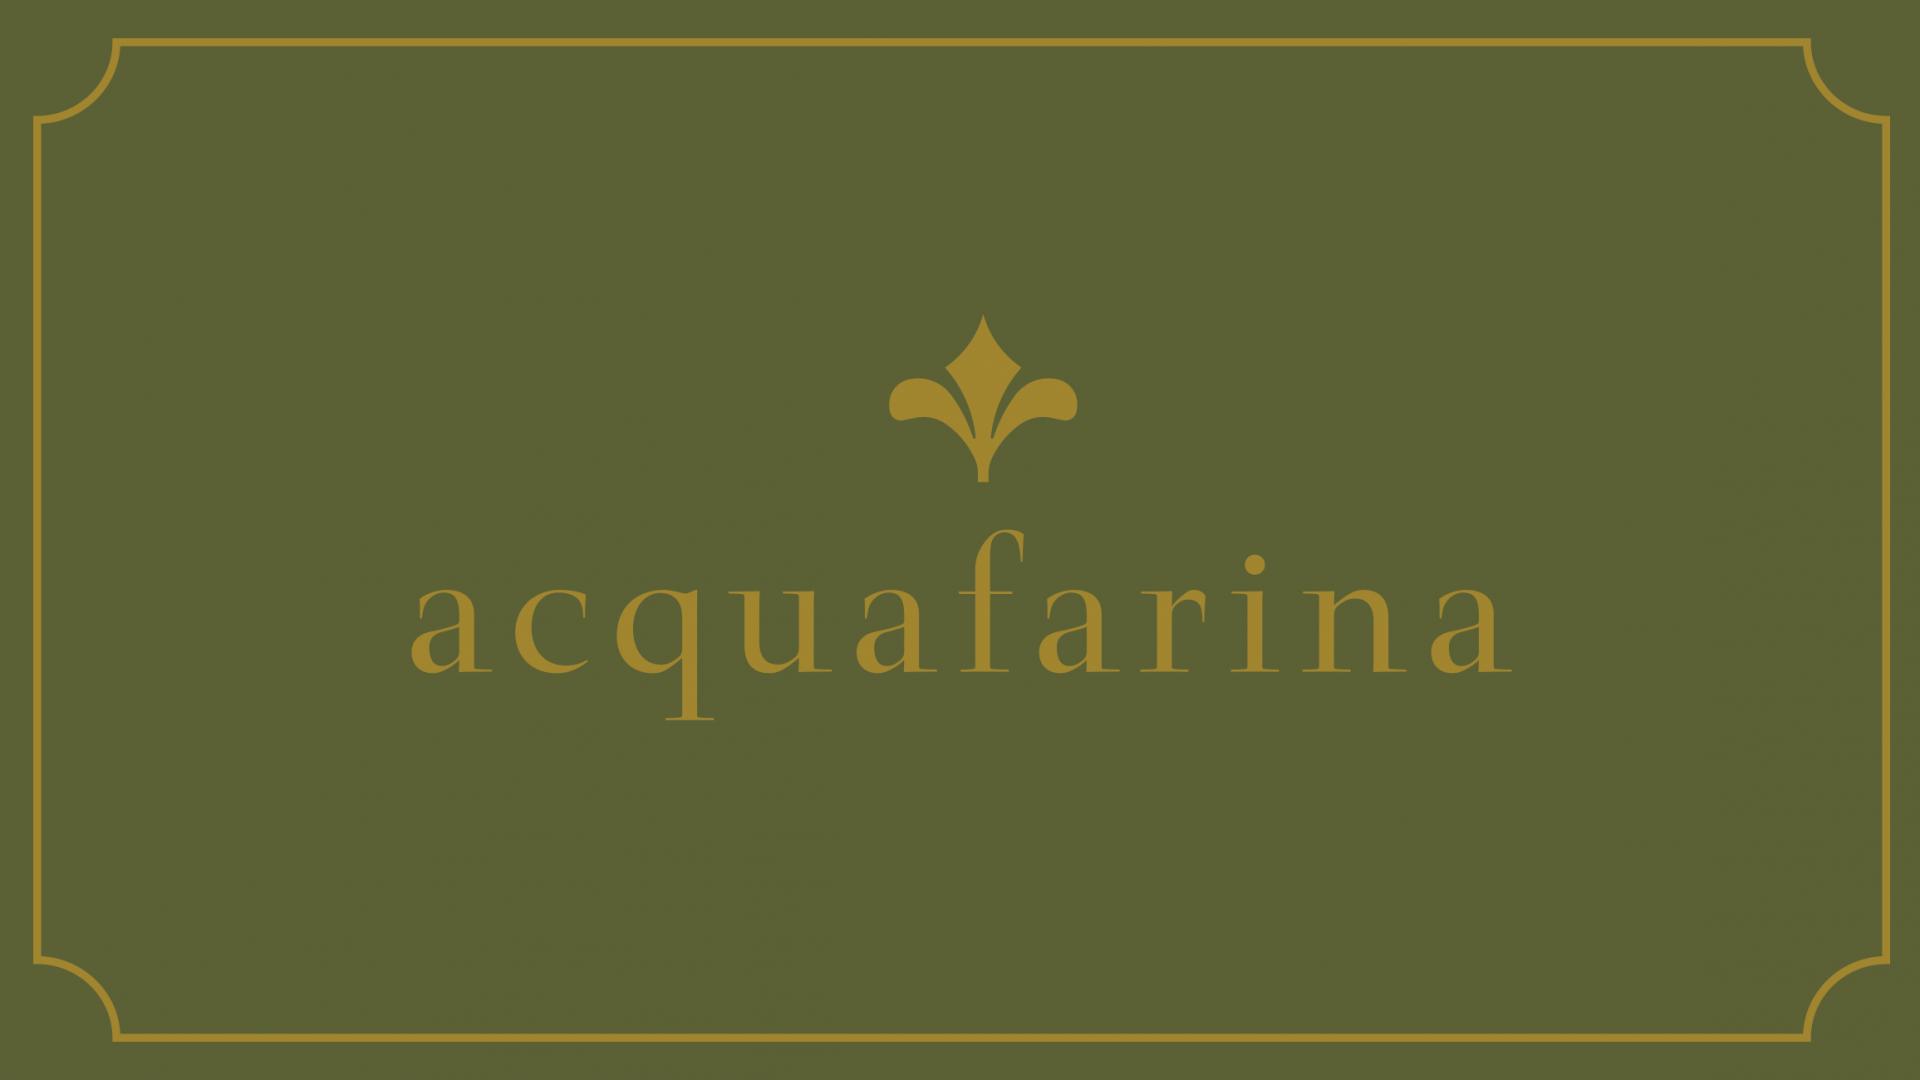 logo-background-green